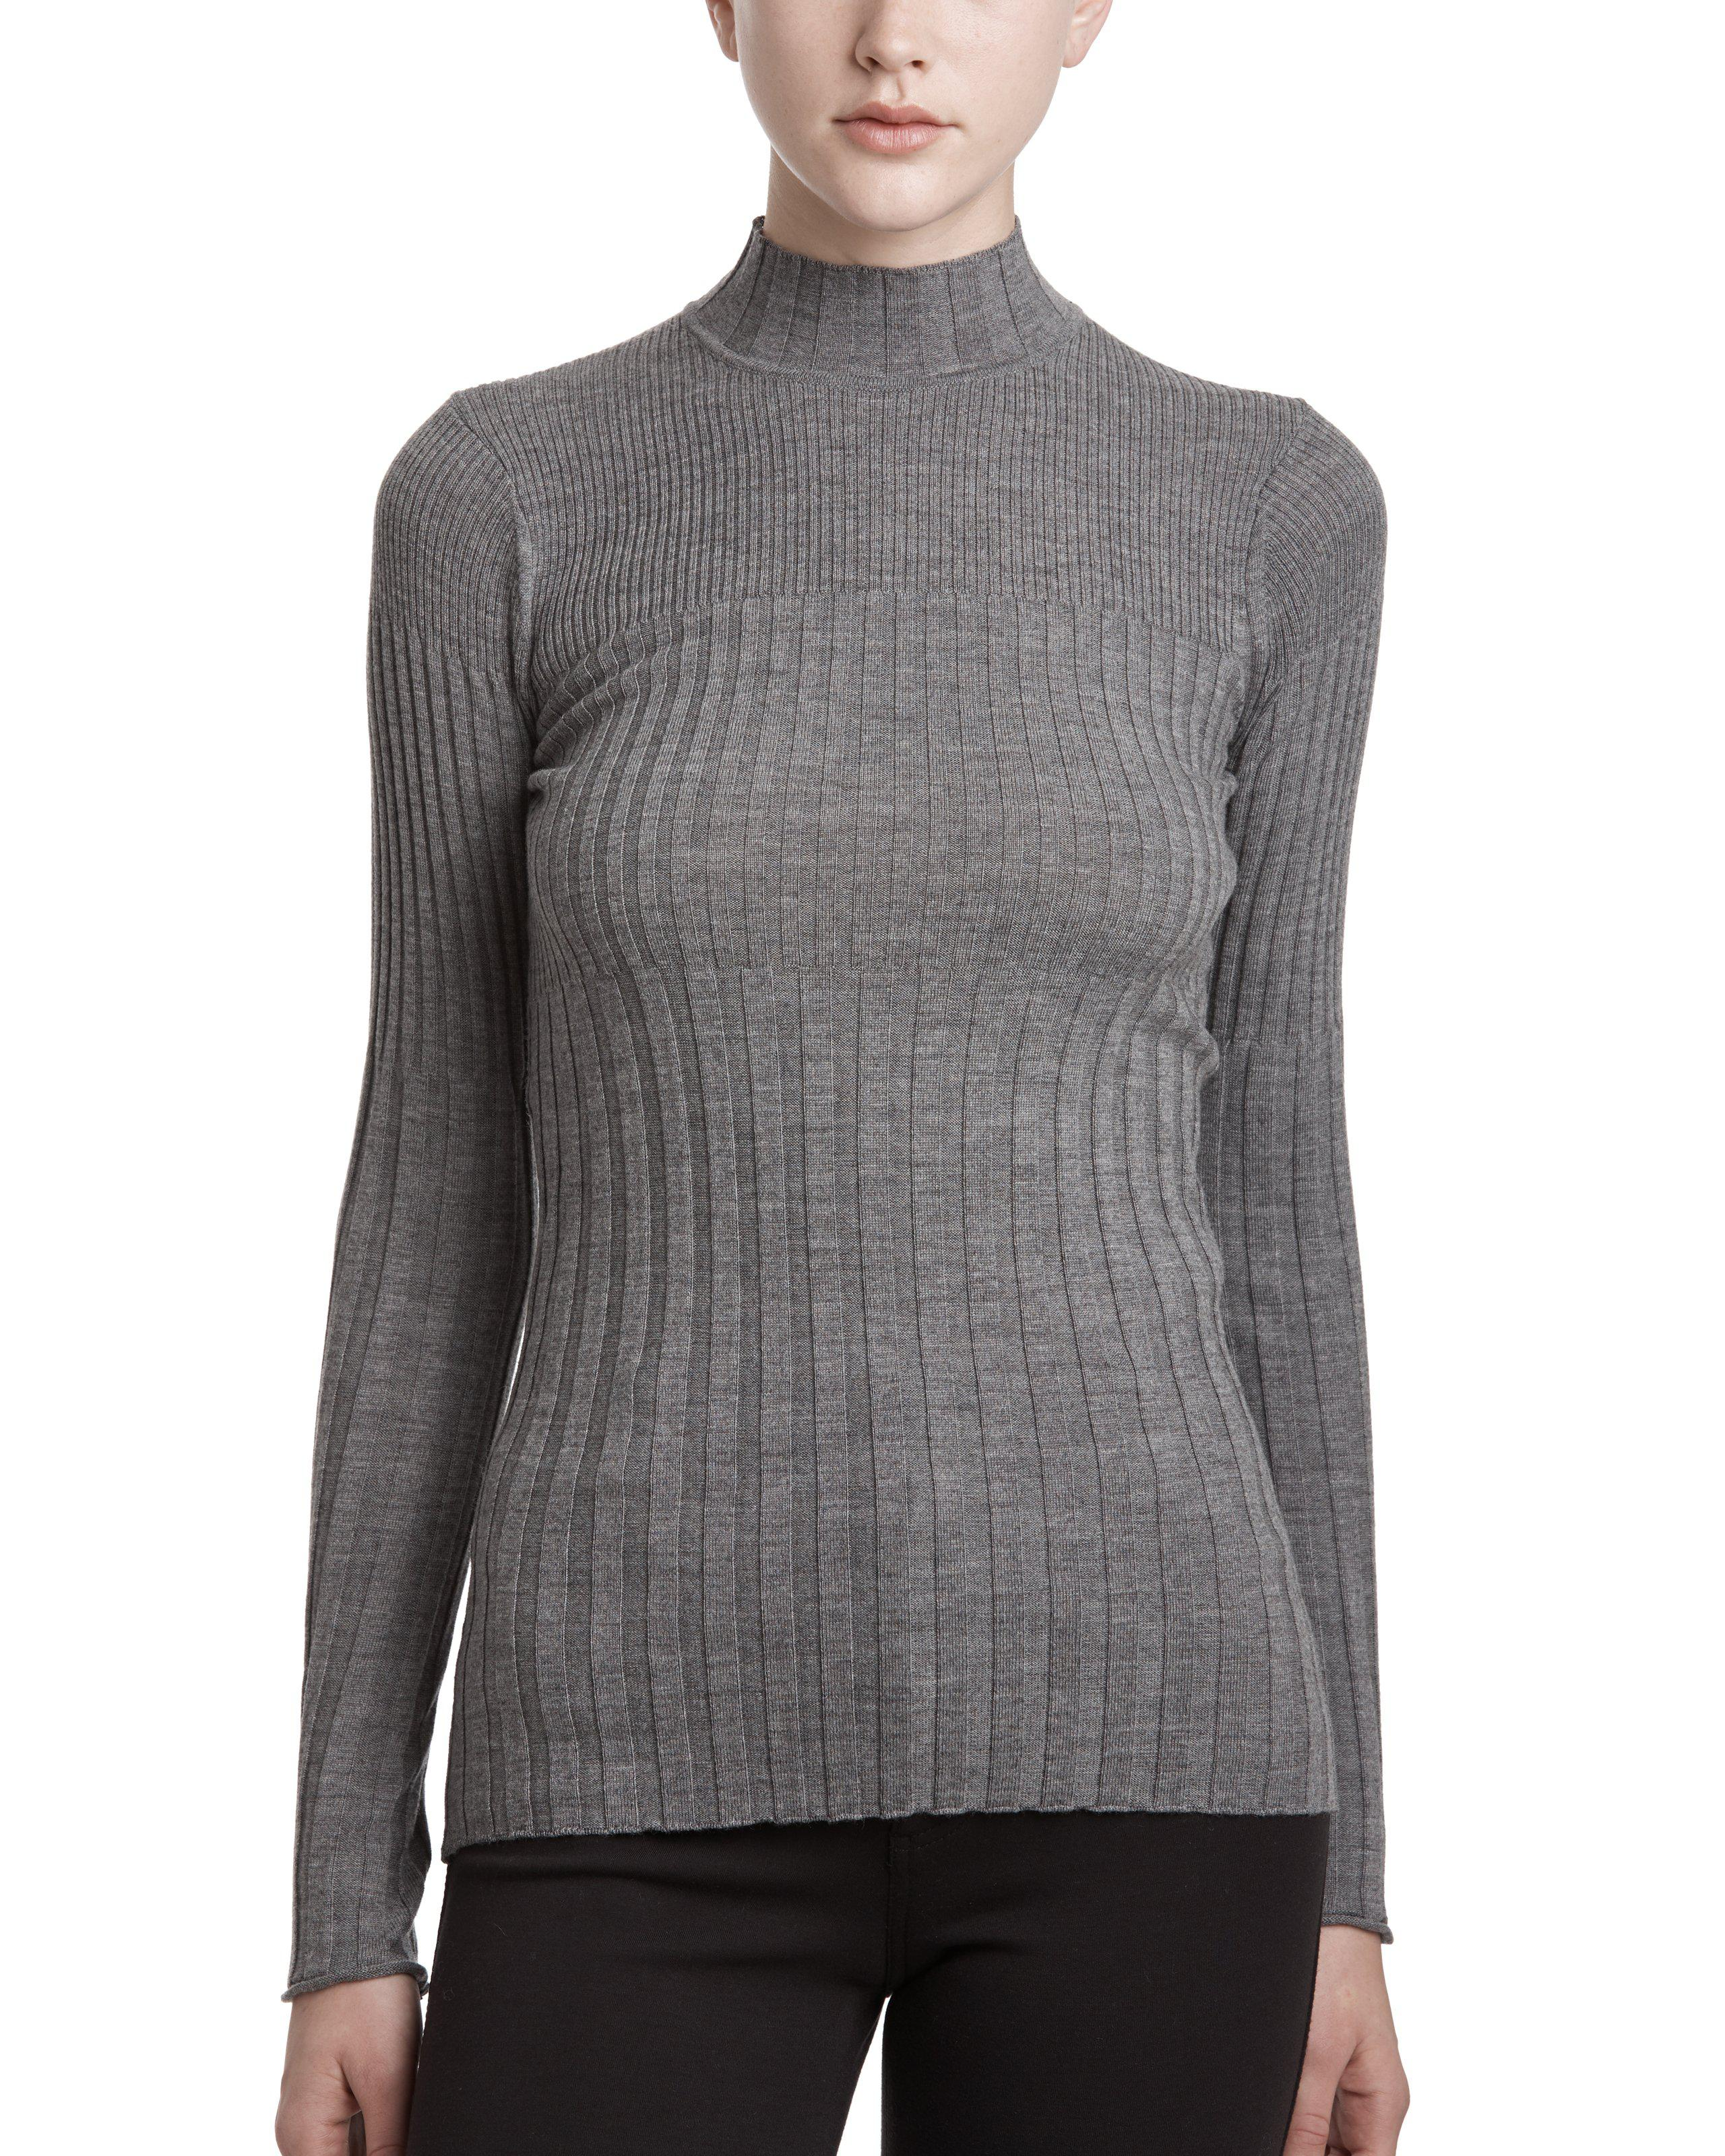 Atm Merino Wool Variegated Rib Turtleneck Sweater in Gray | Lyst